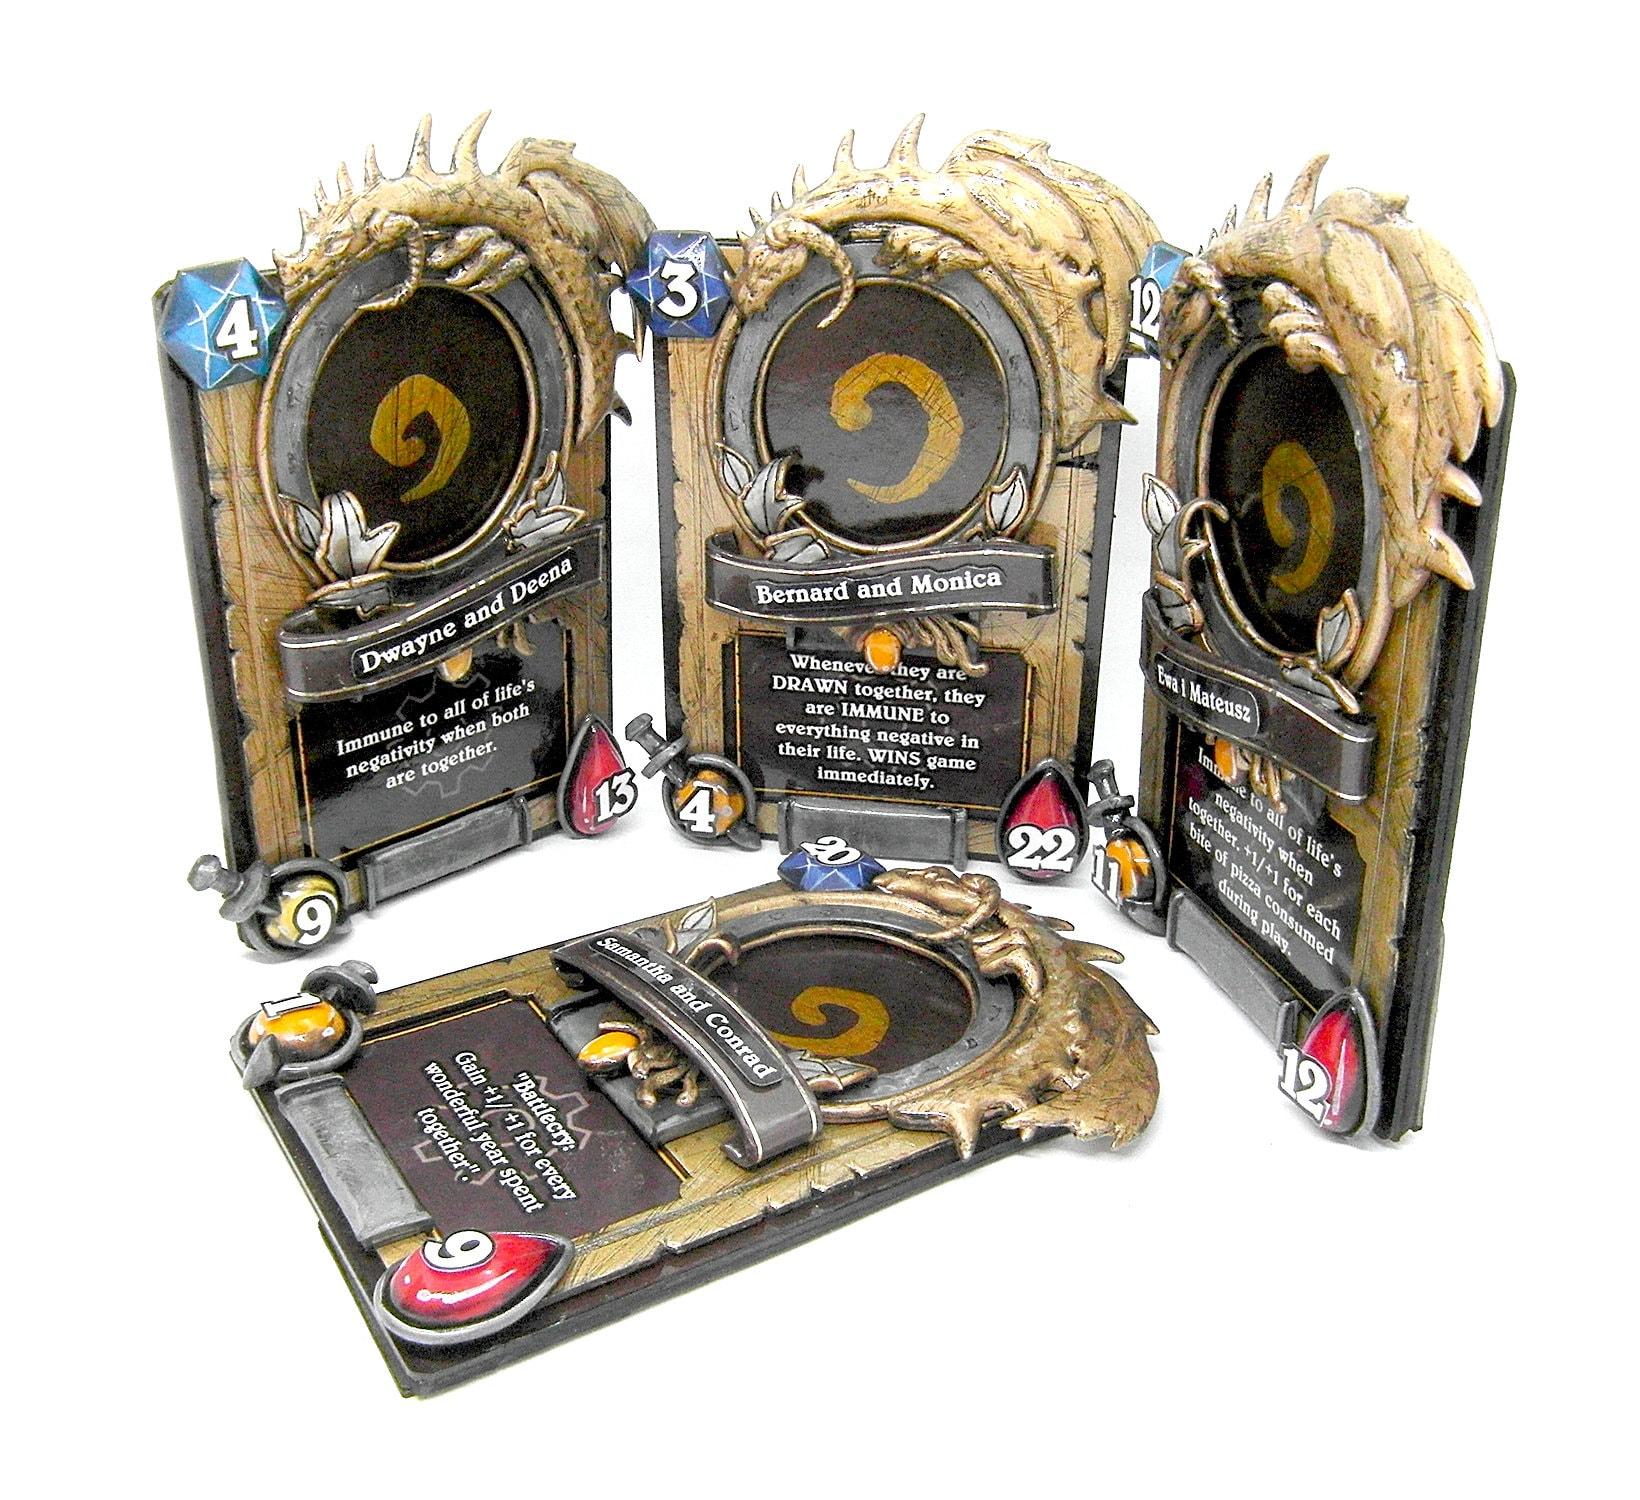 photo frame card hearthstone World of Warcraft original gift fan art  polymer clay gamer game home unusual present man gold cute war craft